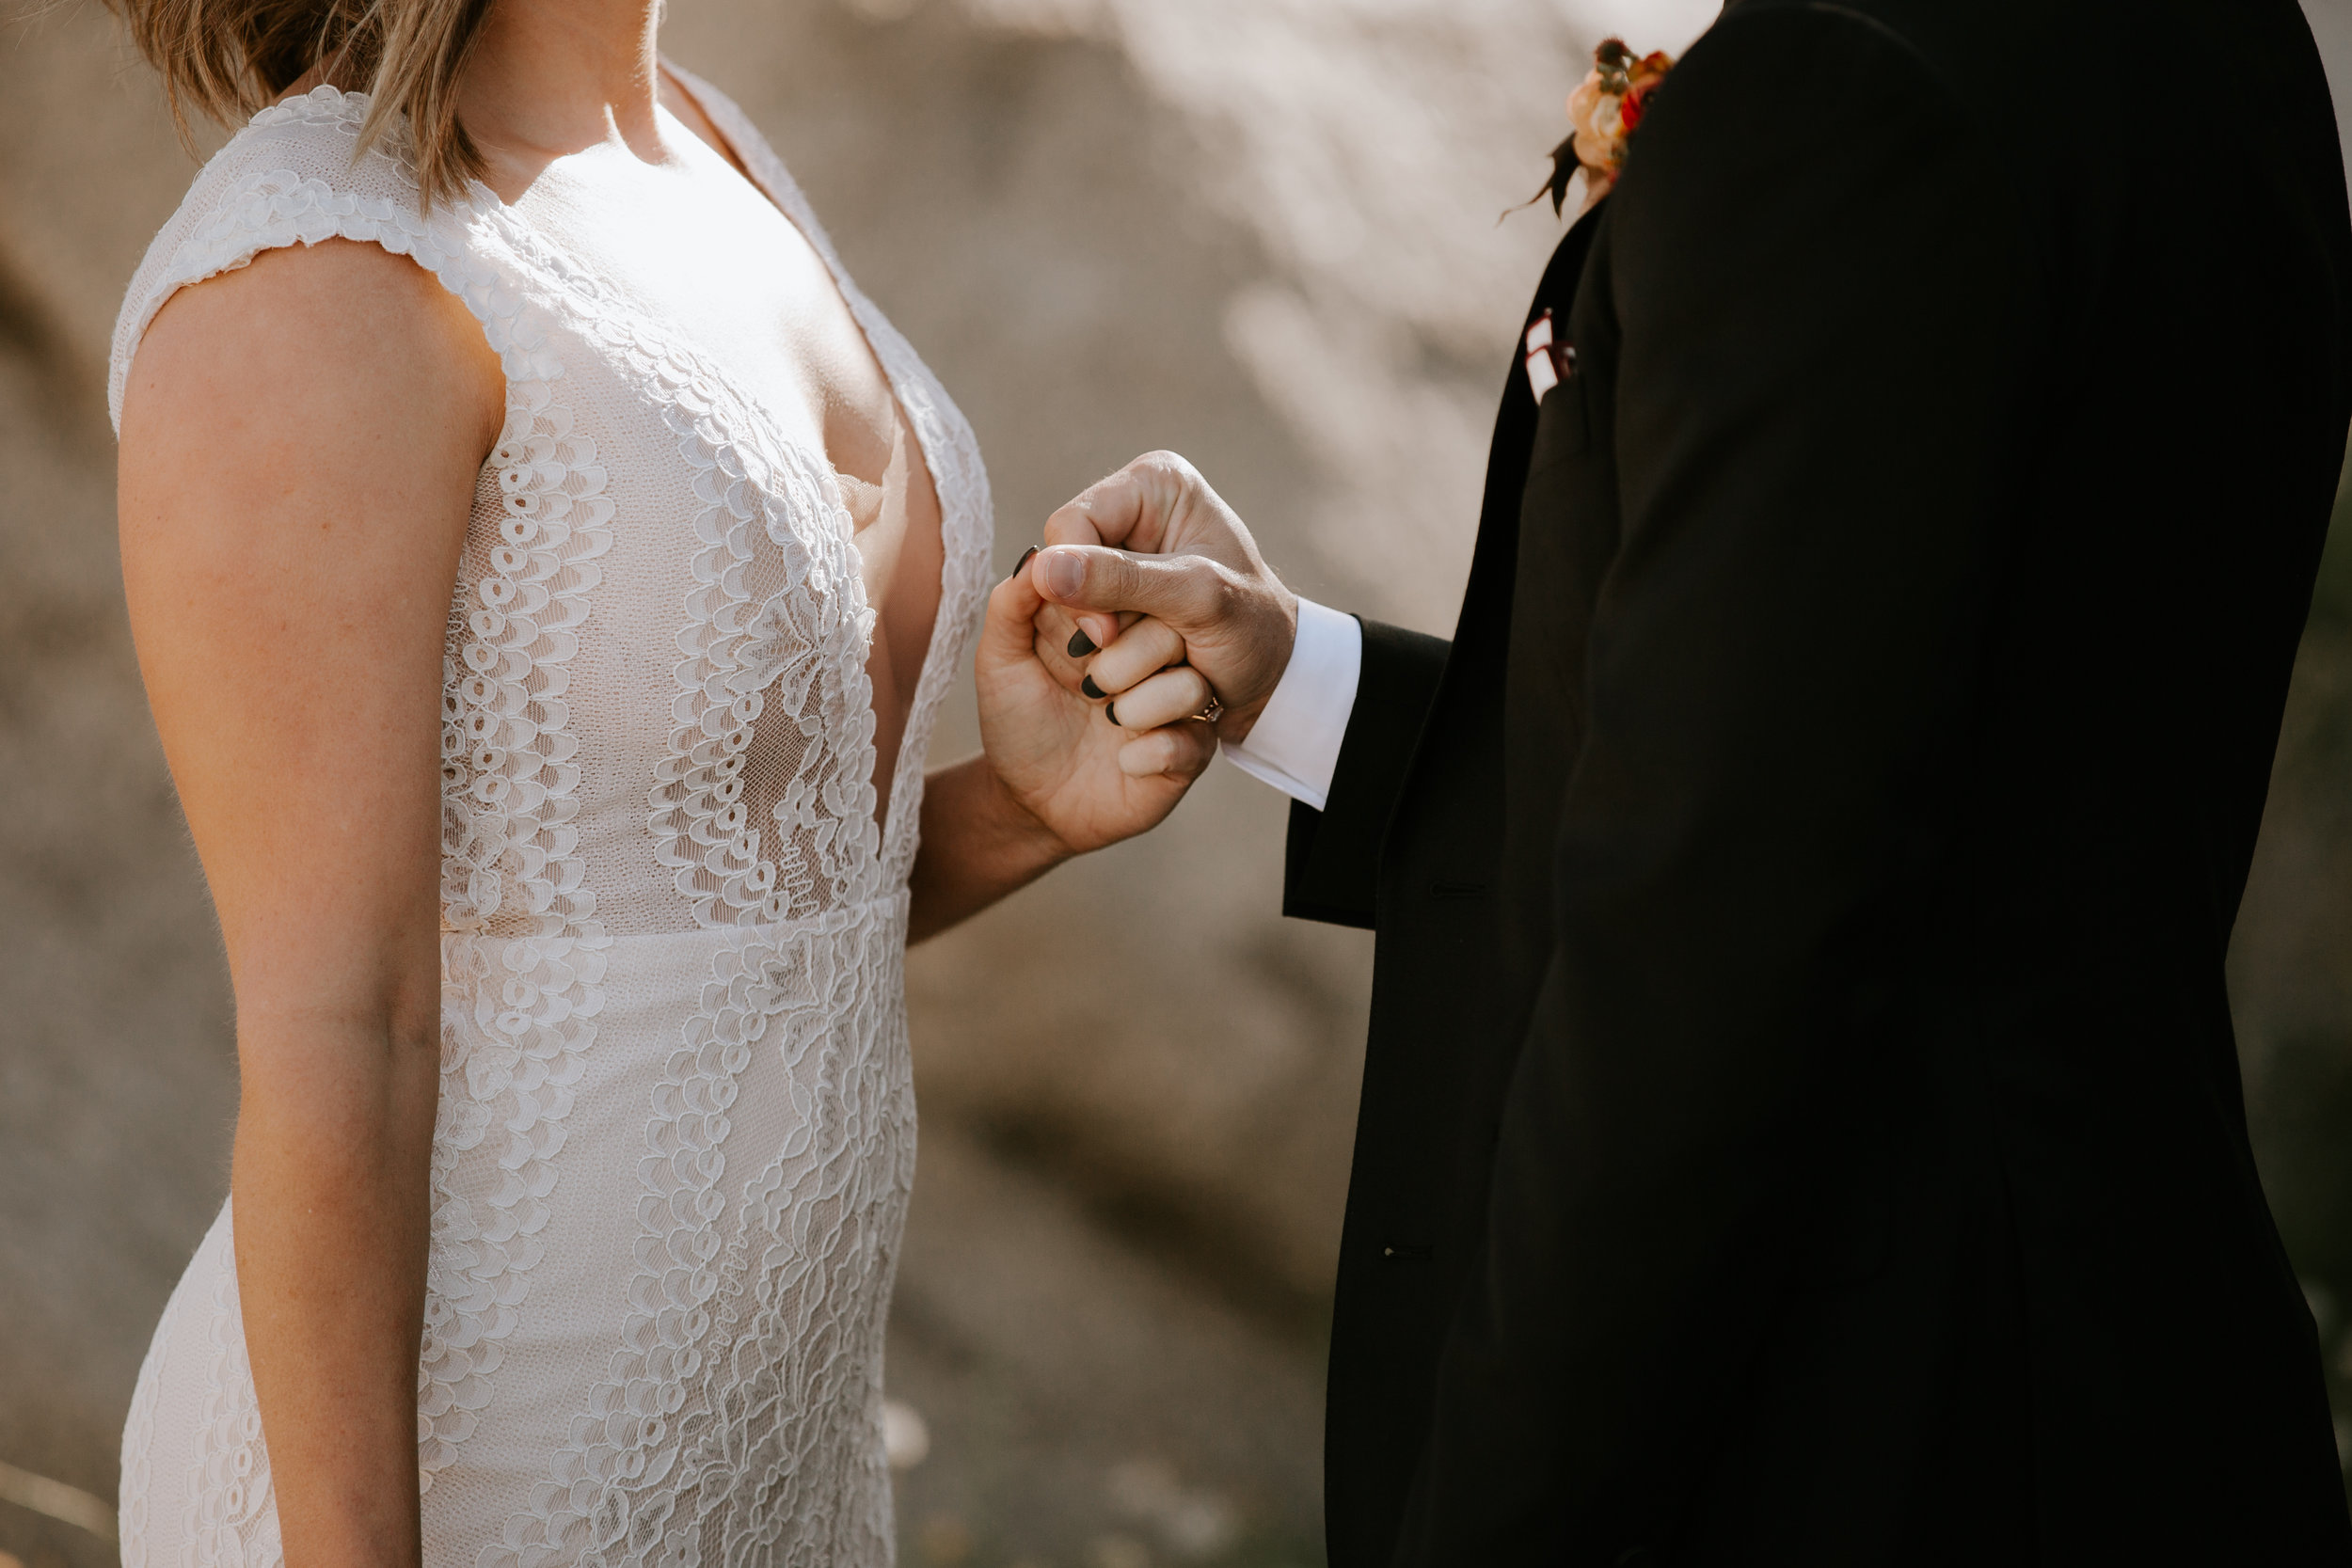 2019-05-26_Callie-Evan_Wedding_Joshua Tree_Paige Nelson_PREVIEWS HR-30.jpg